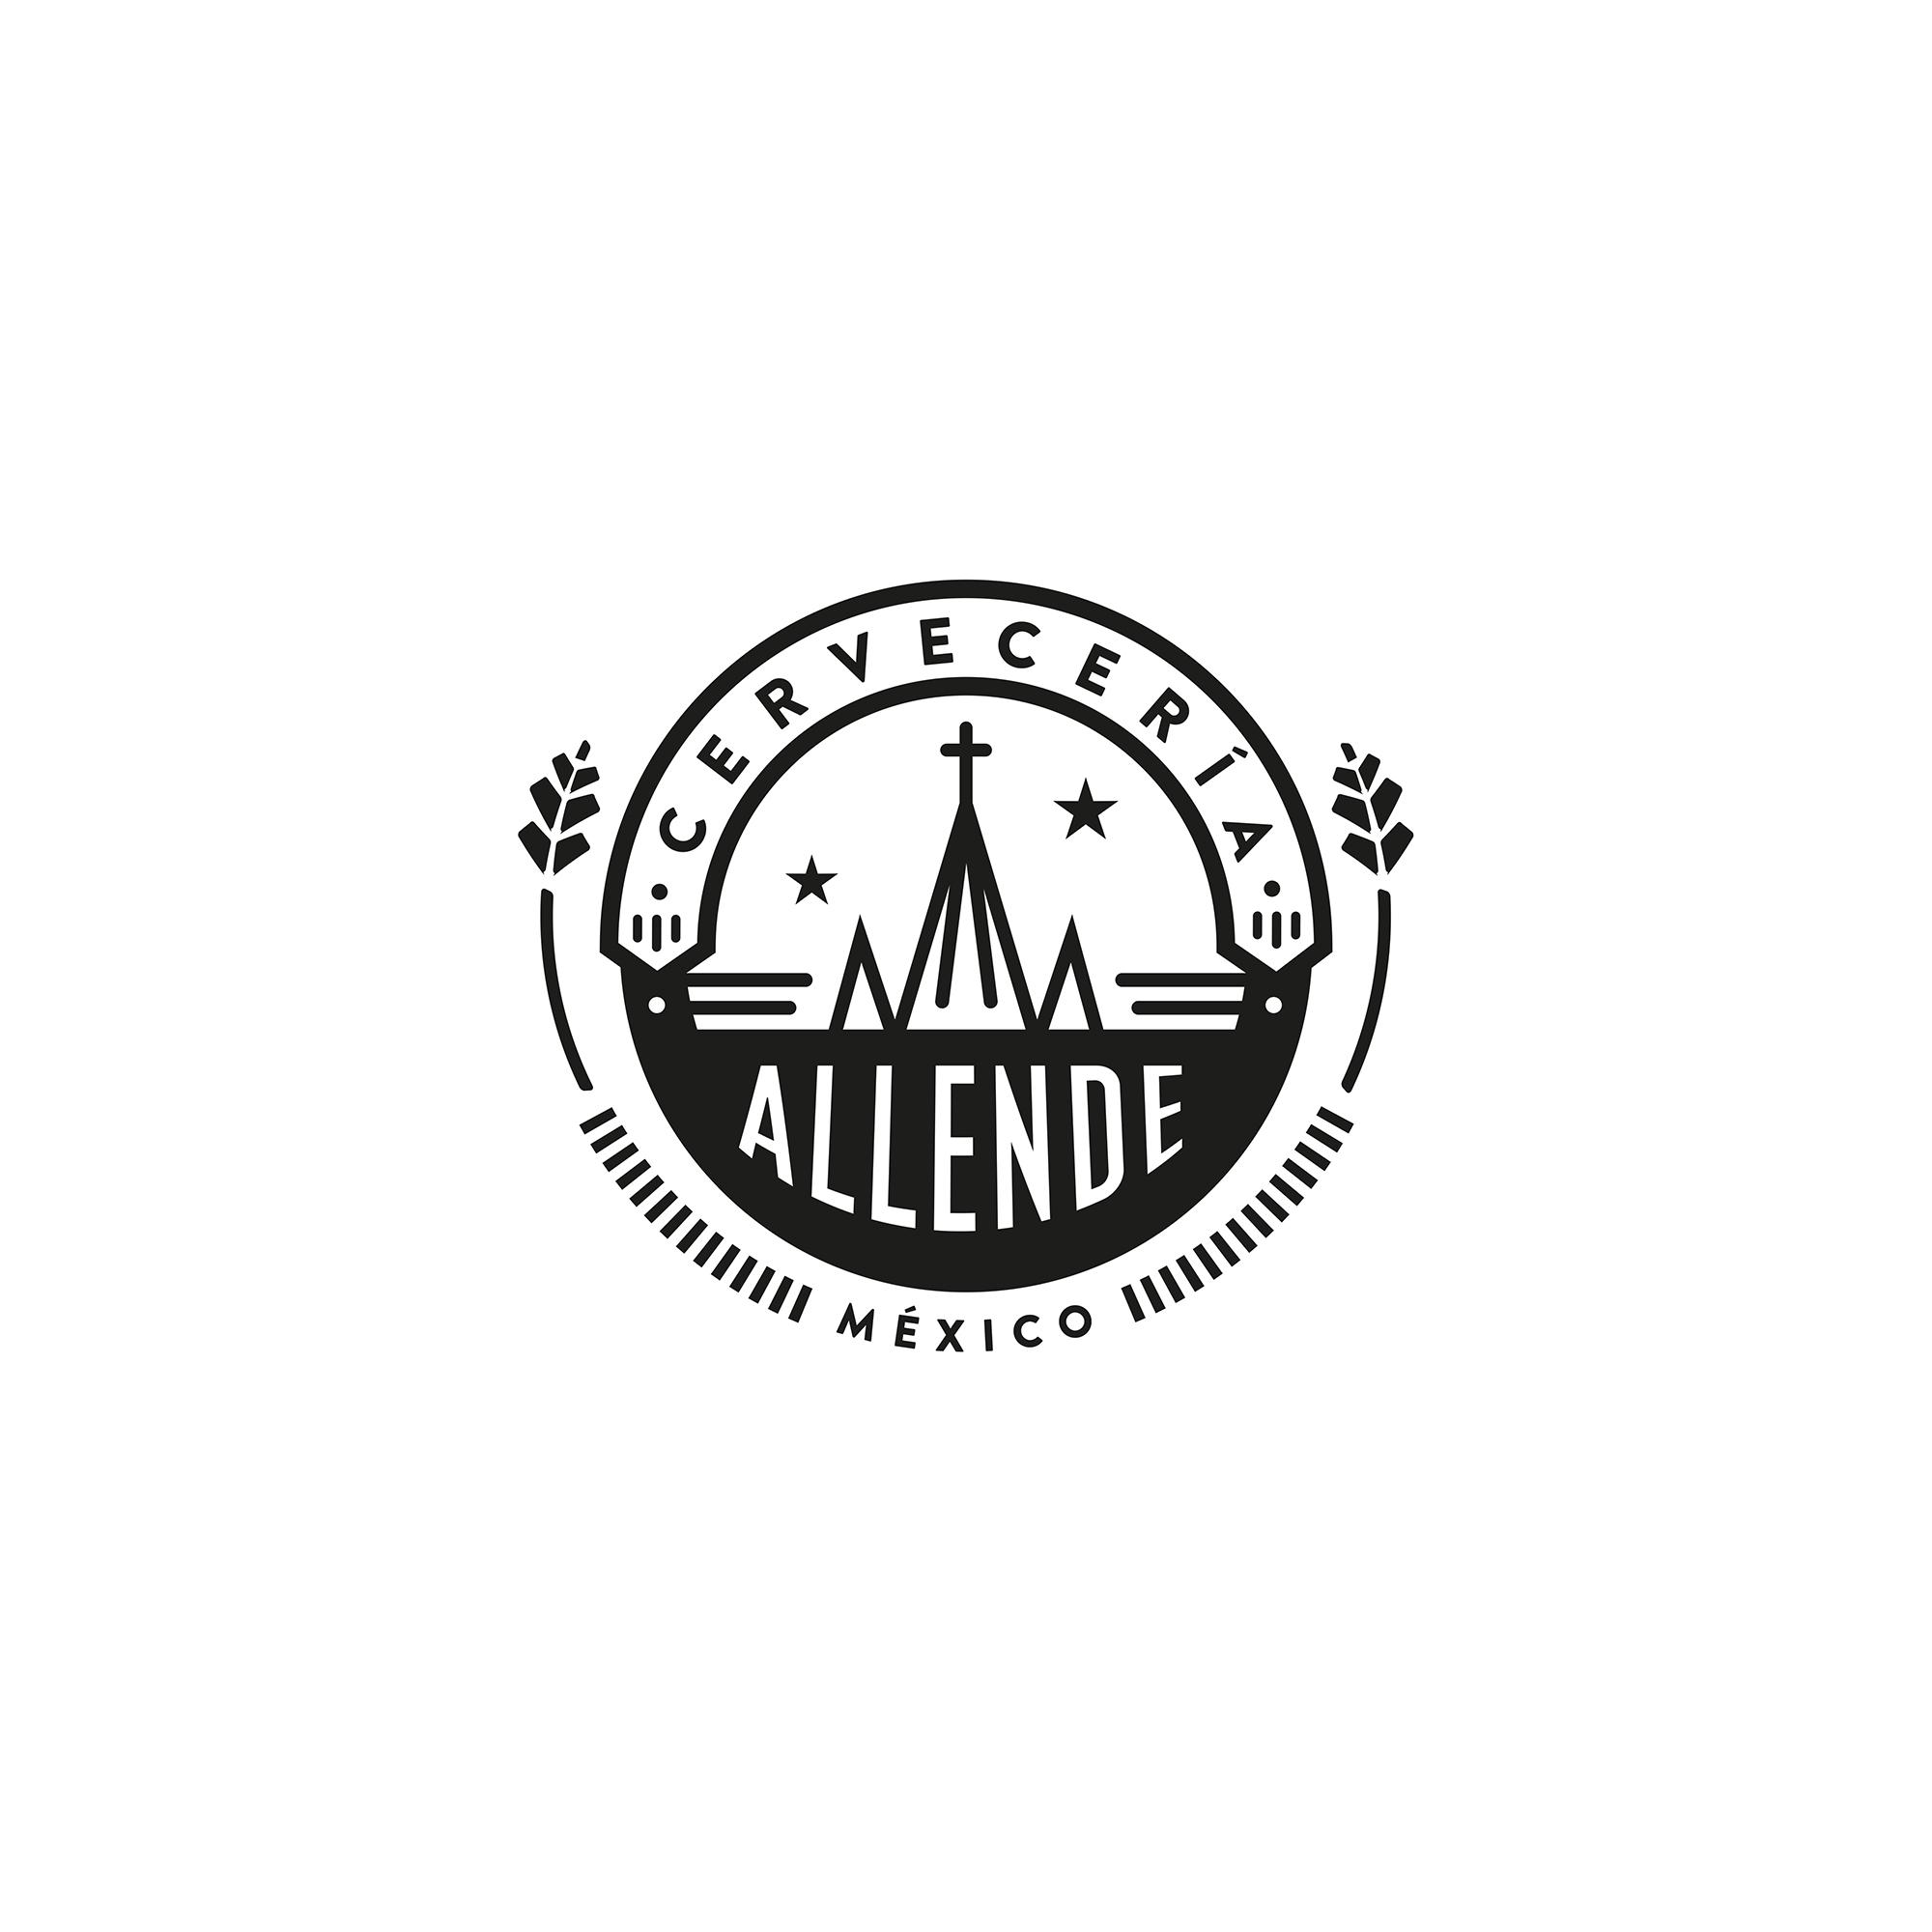 Cerveceria Allende